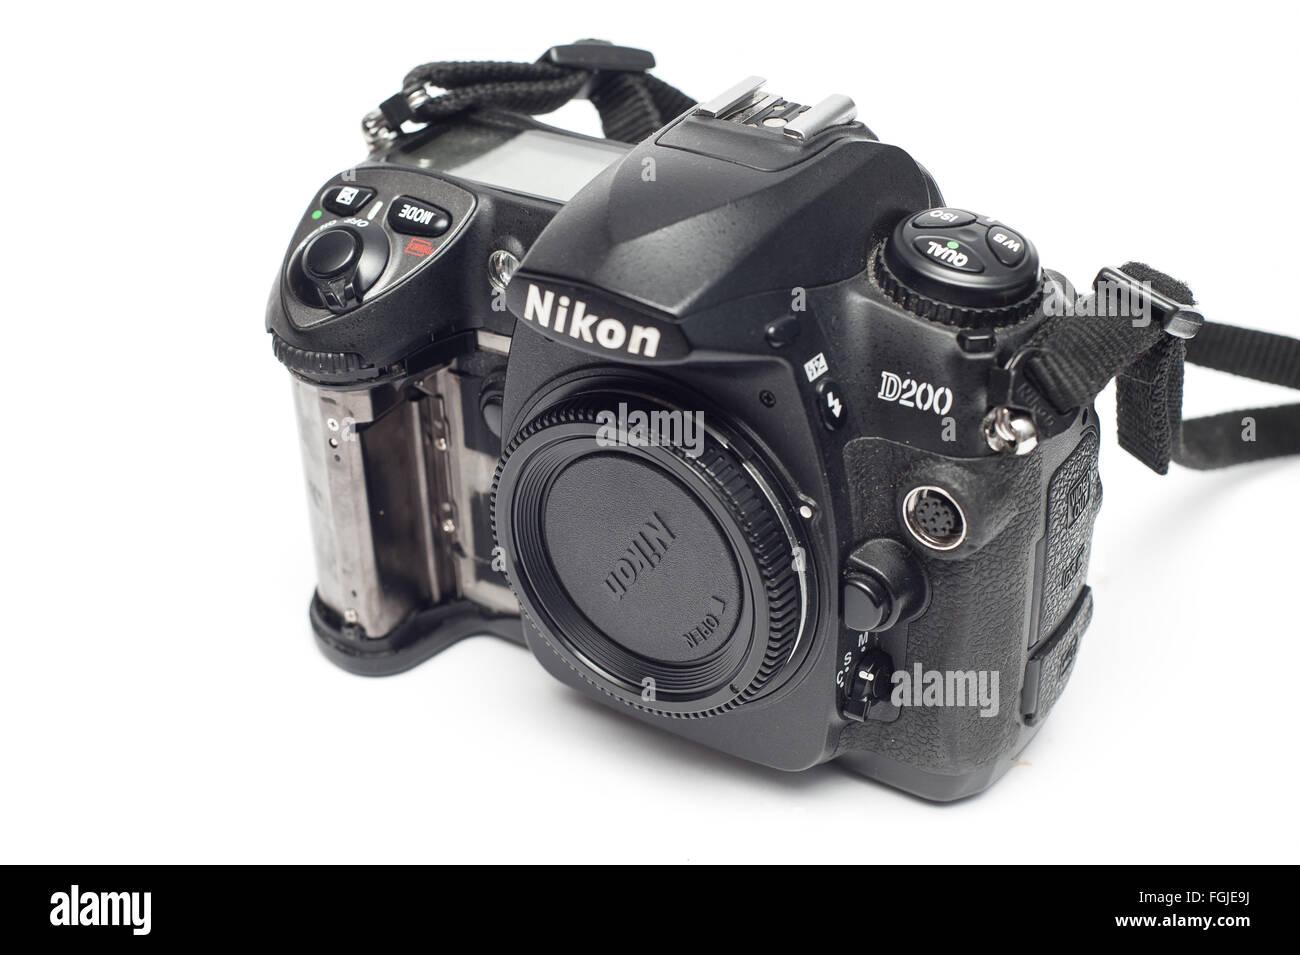 Pavlograd, Donetsk - Januart 27, 2015: Nikon D200 DSLR Camera with loose rubber. Isolated on white background - Stock Image